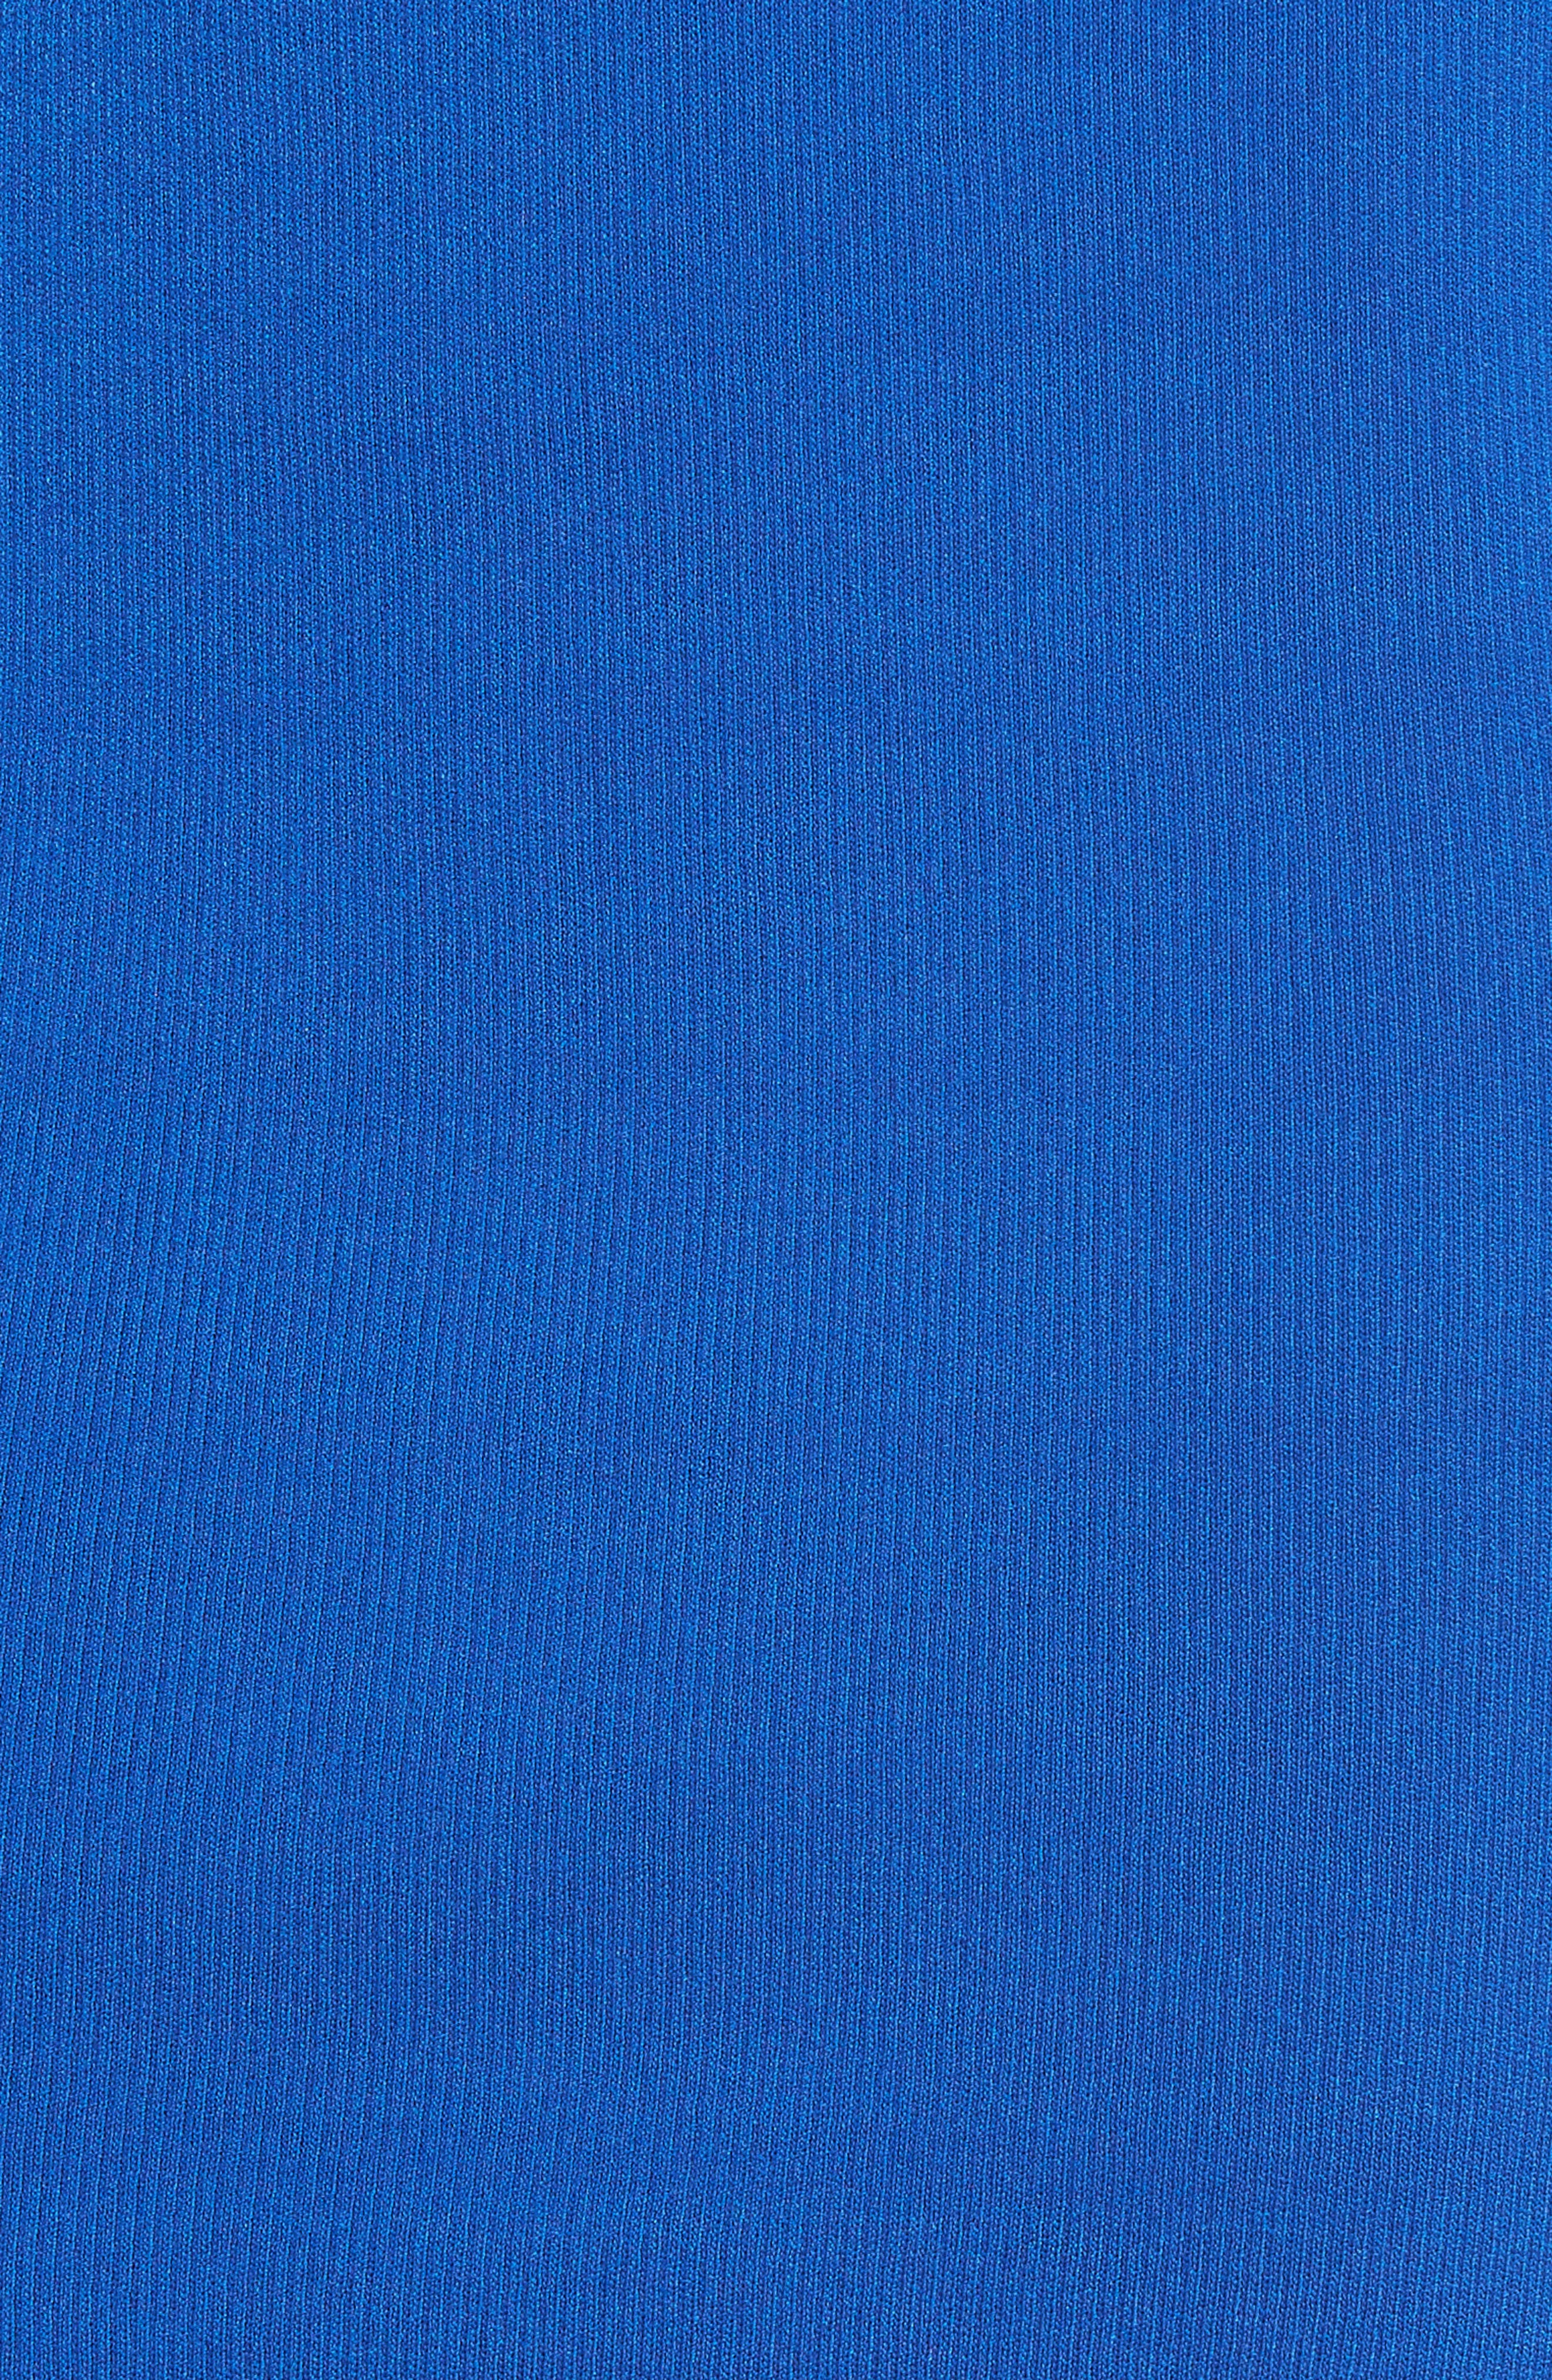 Bell Sleeve Body-Con Dress,                             Alternate thumbnail 5, color,                             403